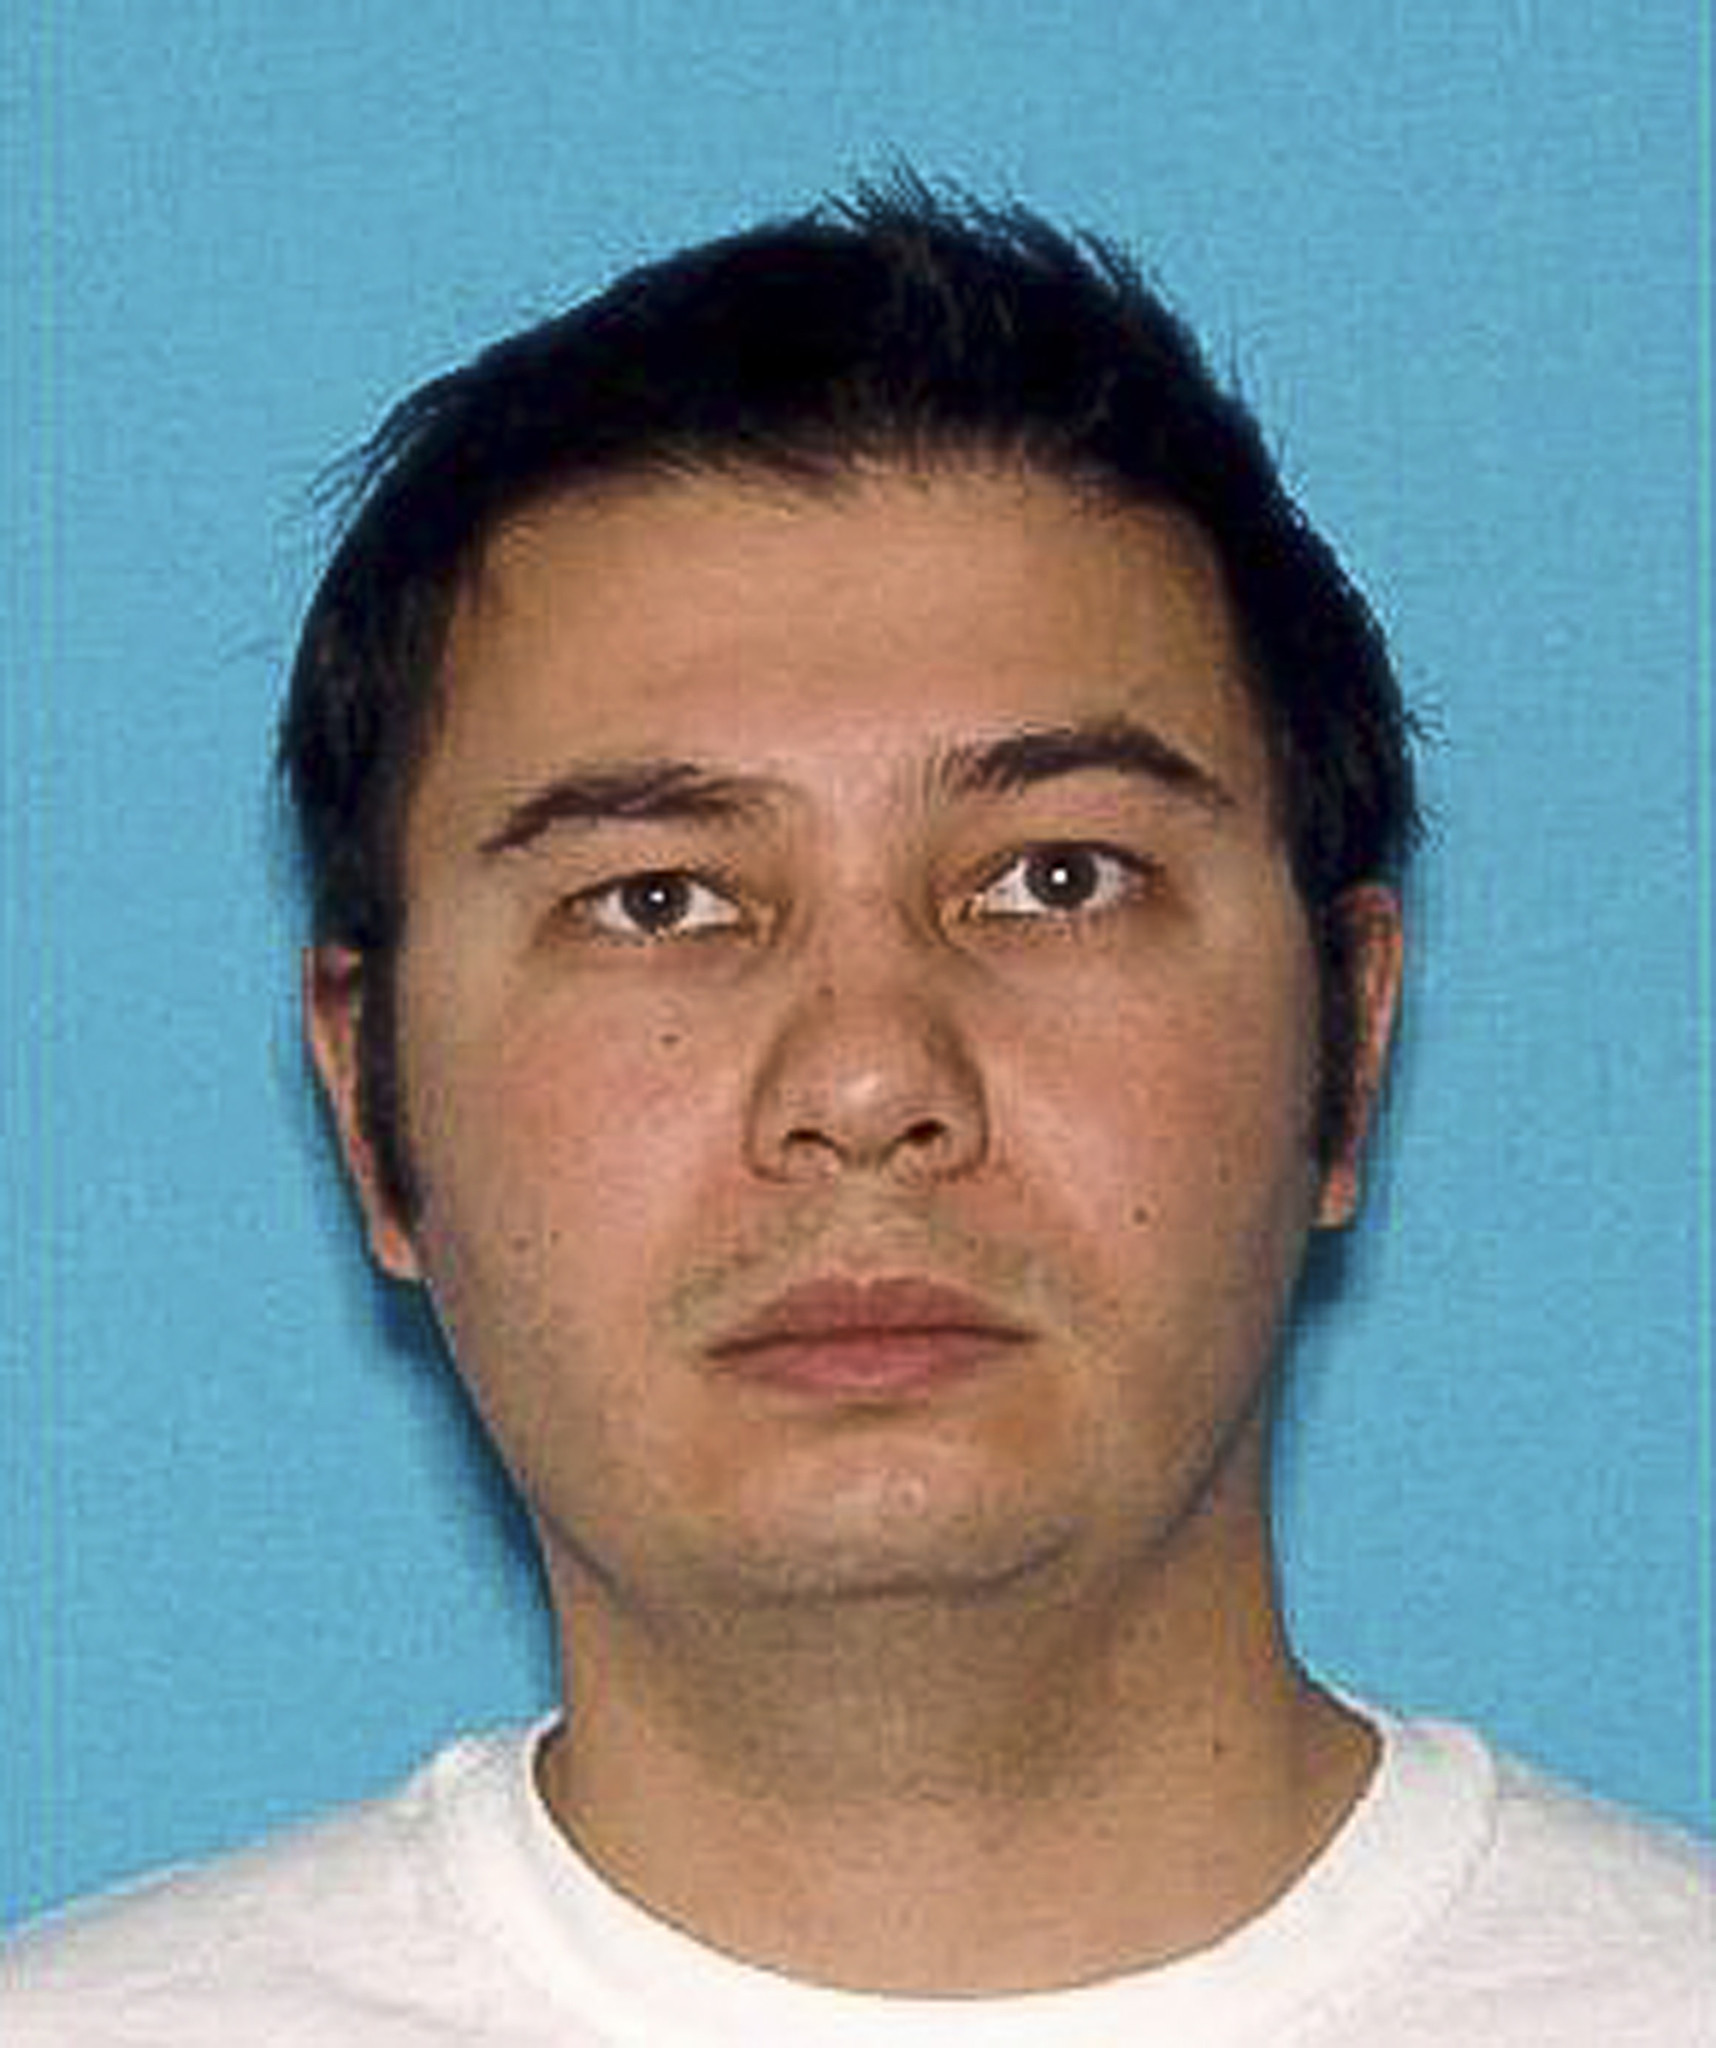 Man Who Killed Colorado Deputy Fled Mental Ward In 2014